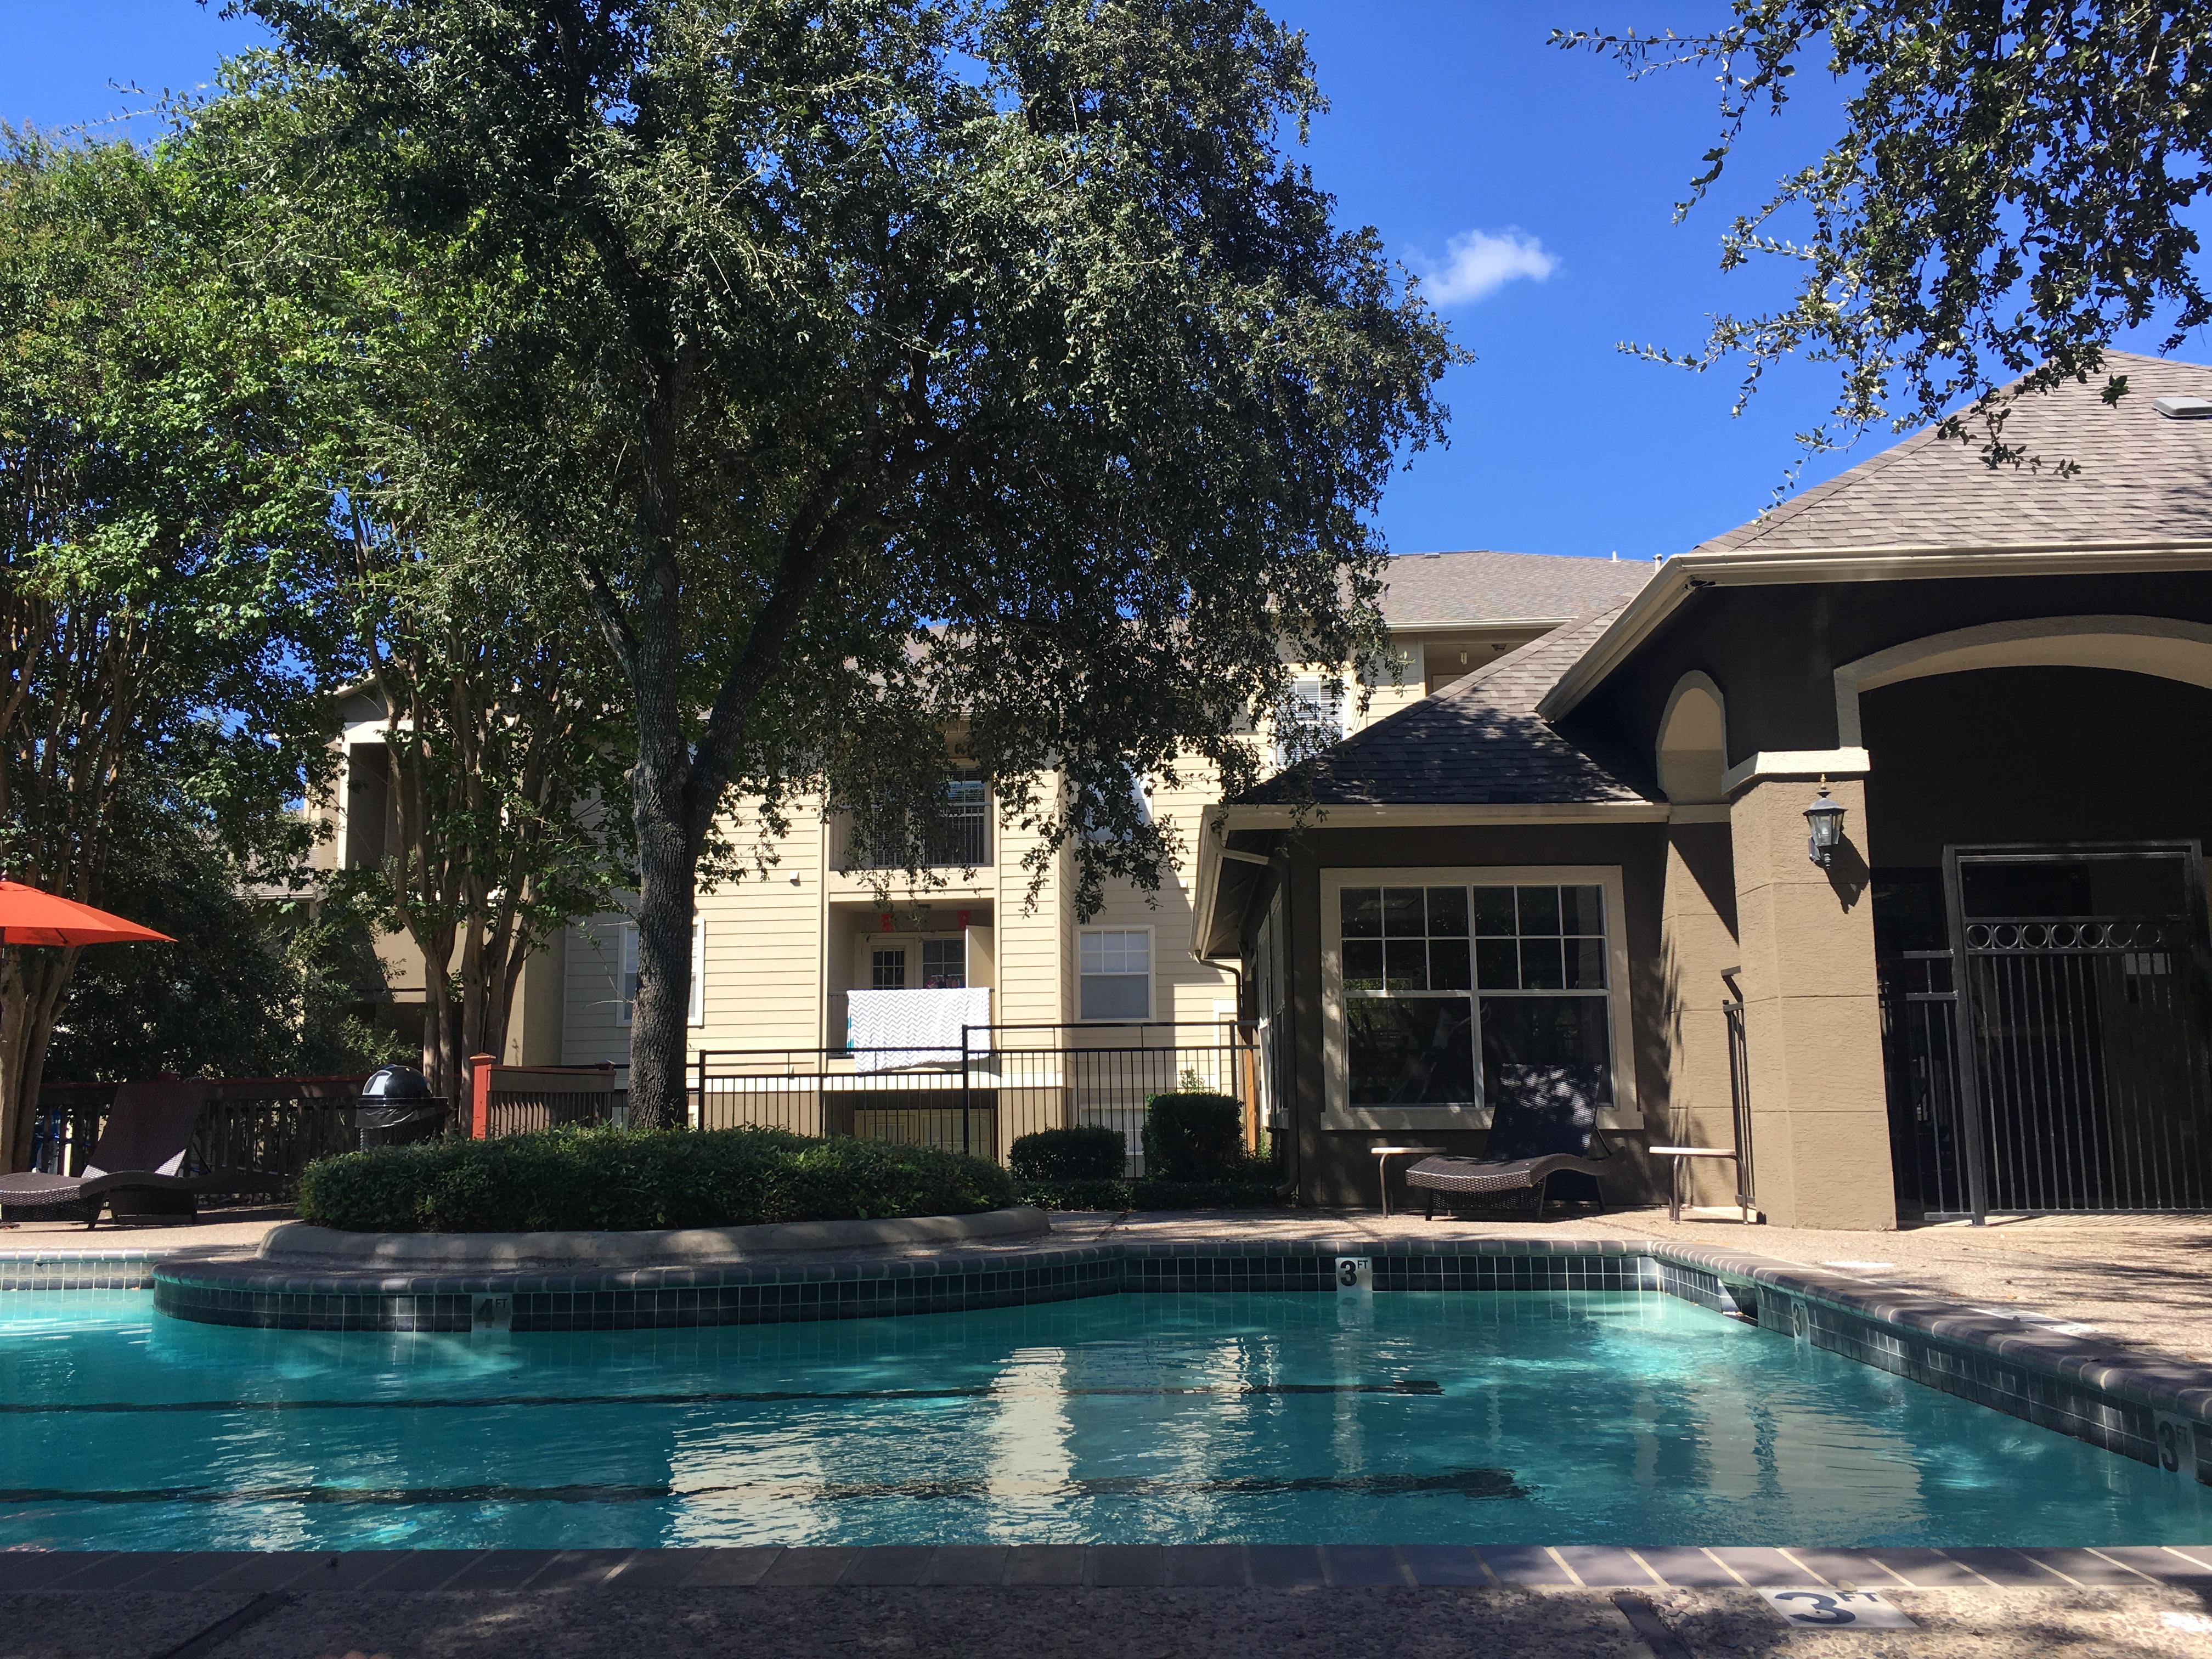 【SSNなし】アメリカ超初心者がテキサス州サンアントニオでアパート契約した体験談